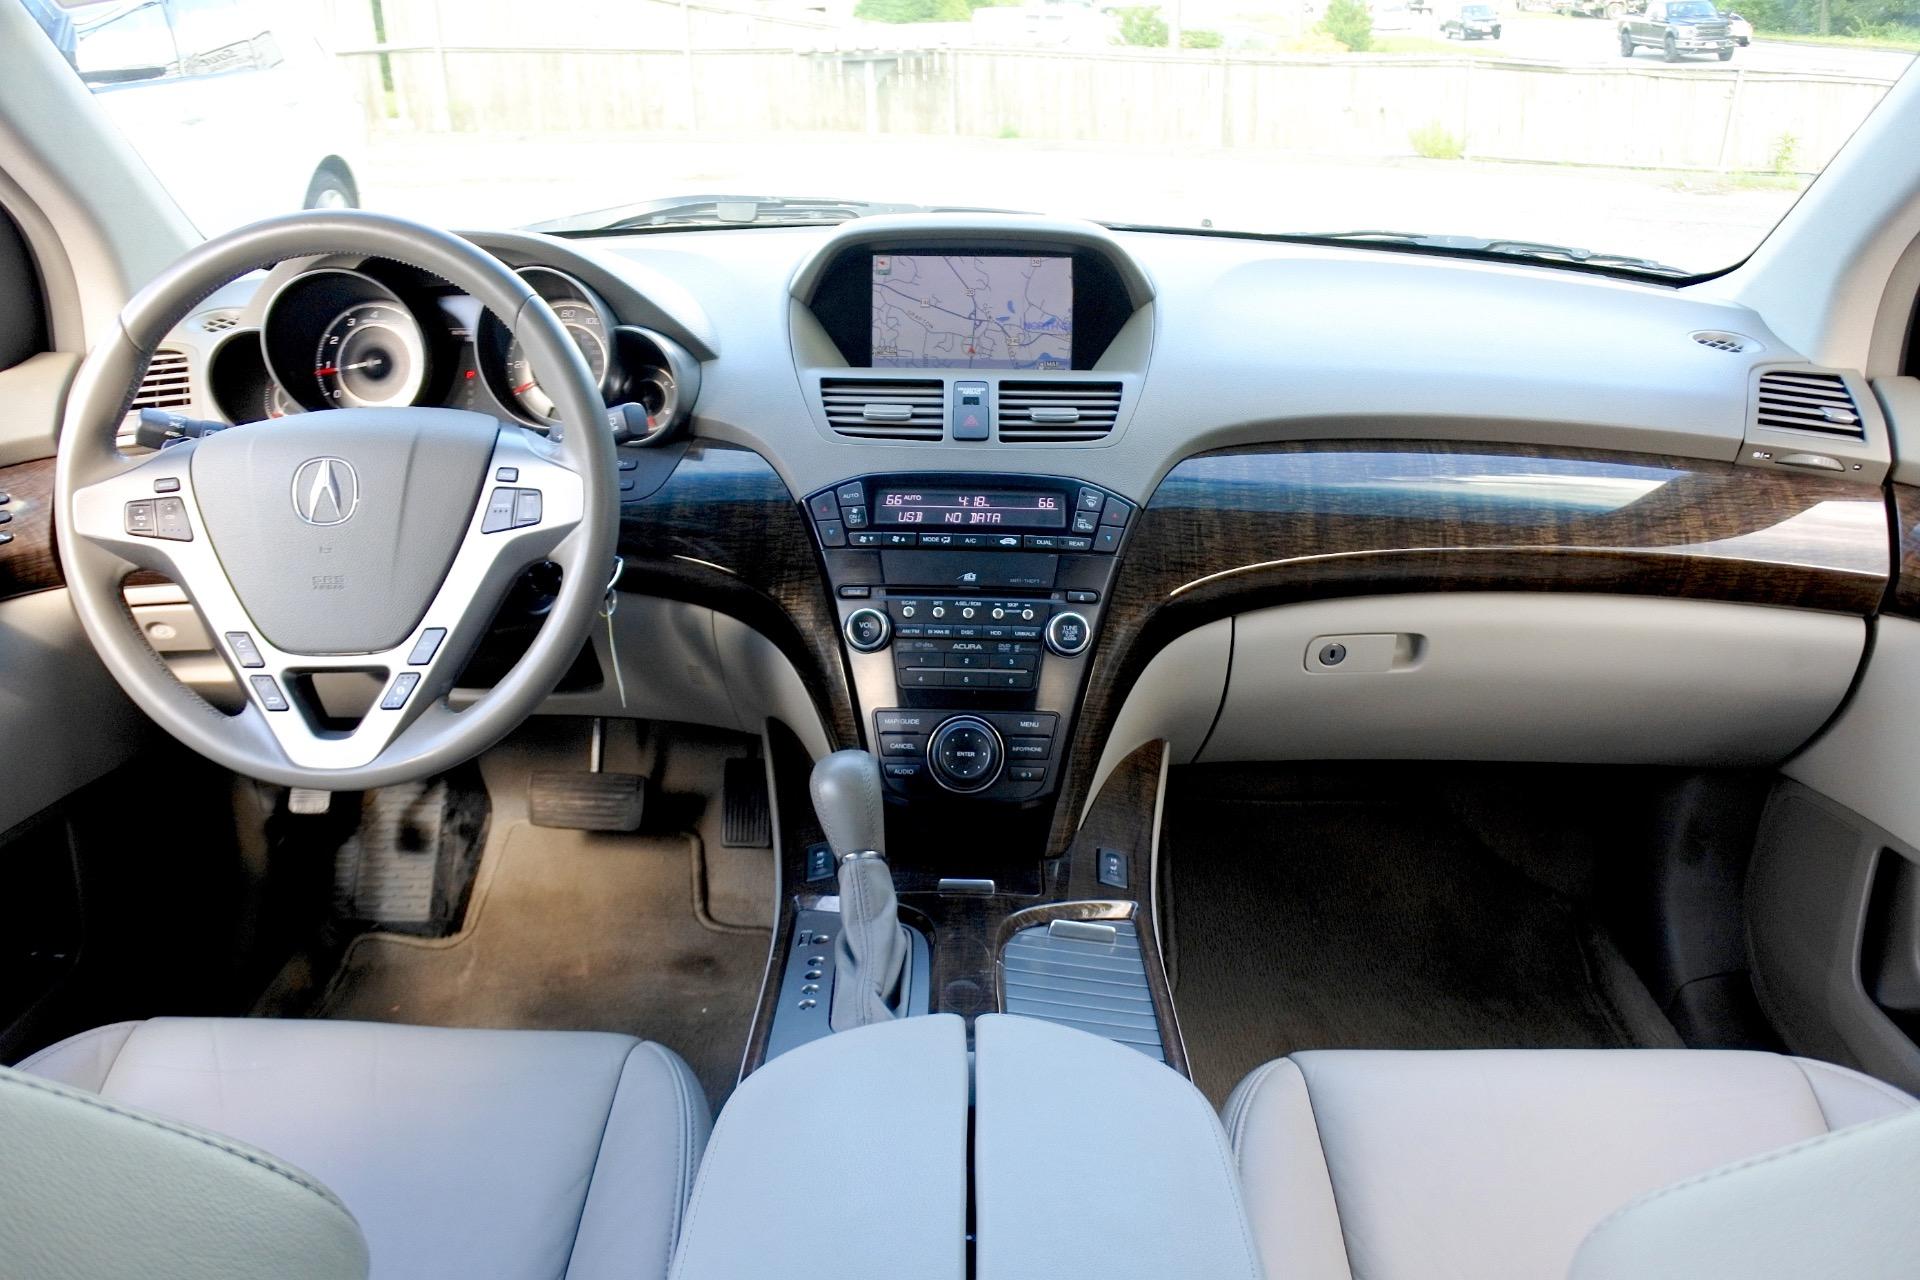 Used 2011 Acura Mdx AWD Tech Pkg Used 2011 Acura Mdx AWD Tech Pkg for sale  at Metro West Motorcars LLC in Shrewsbury MA 9